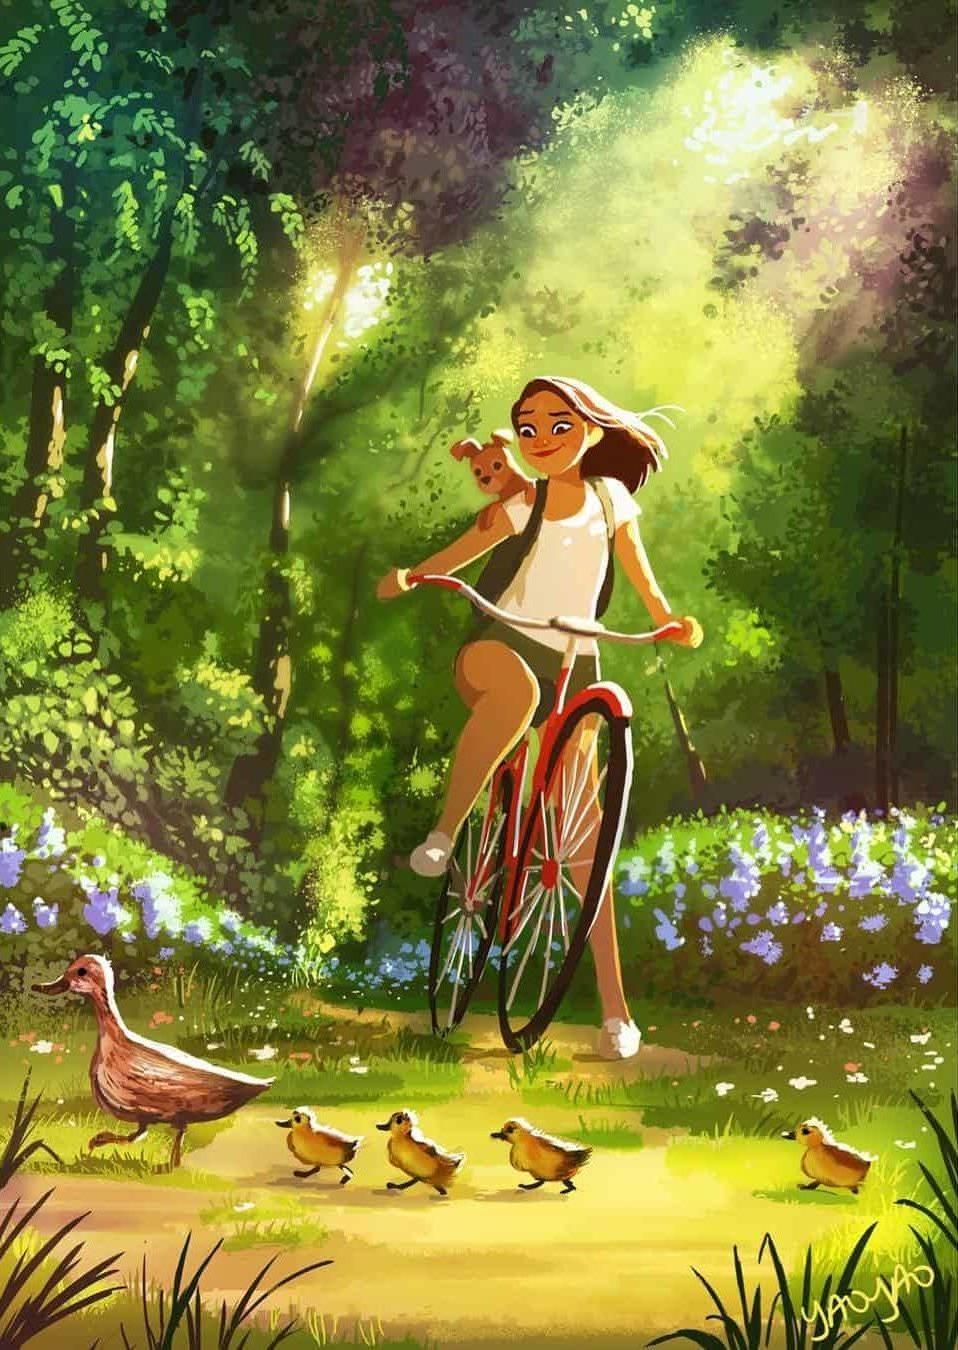 illustrator-yaoyao-52-e1564261573506.jpg